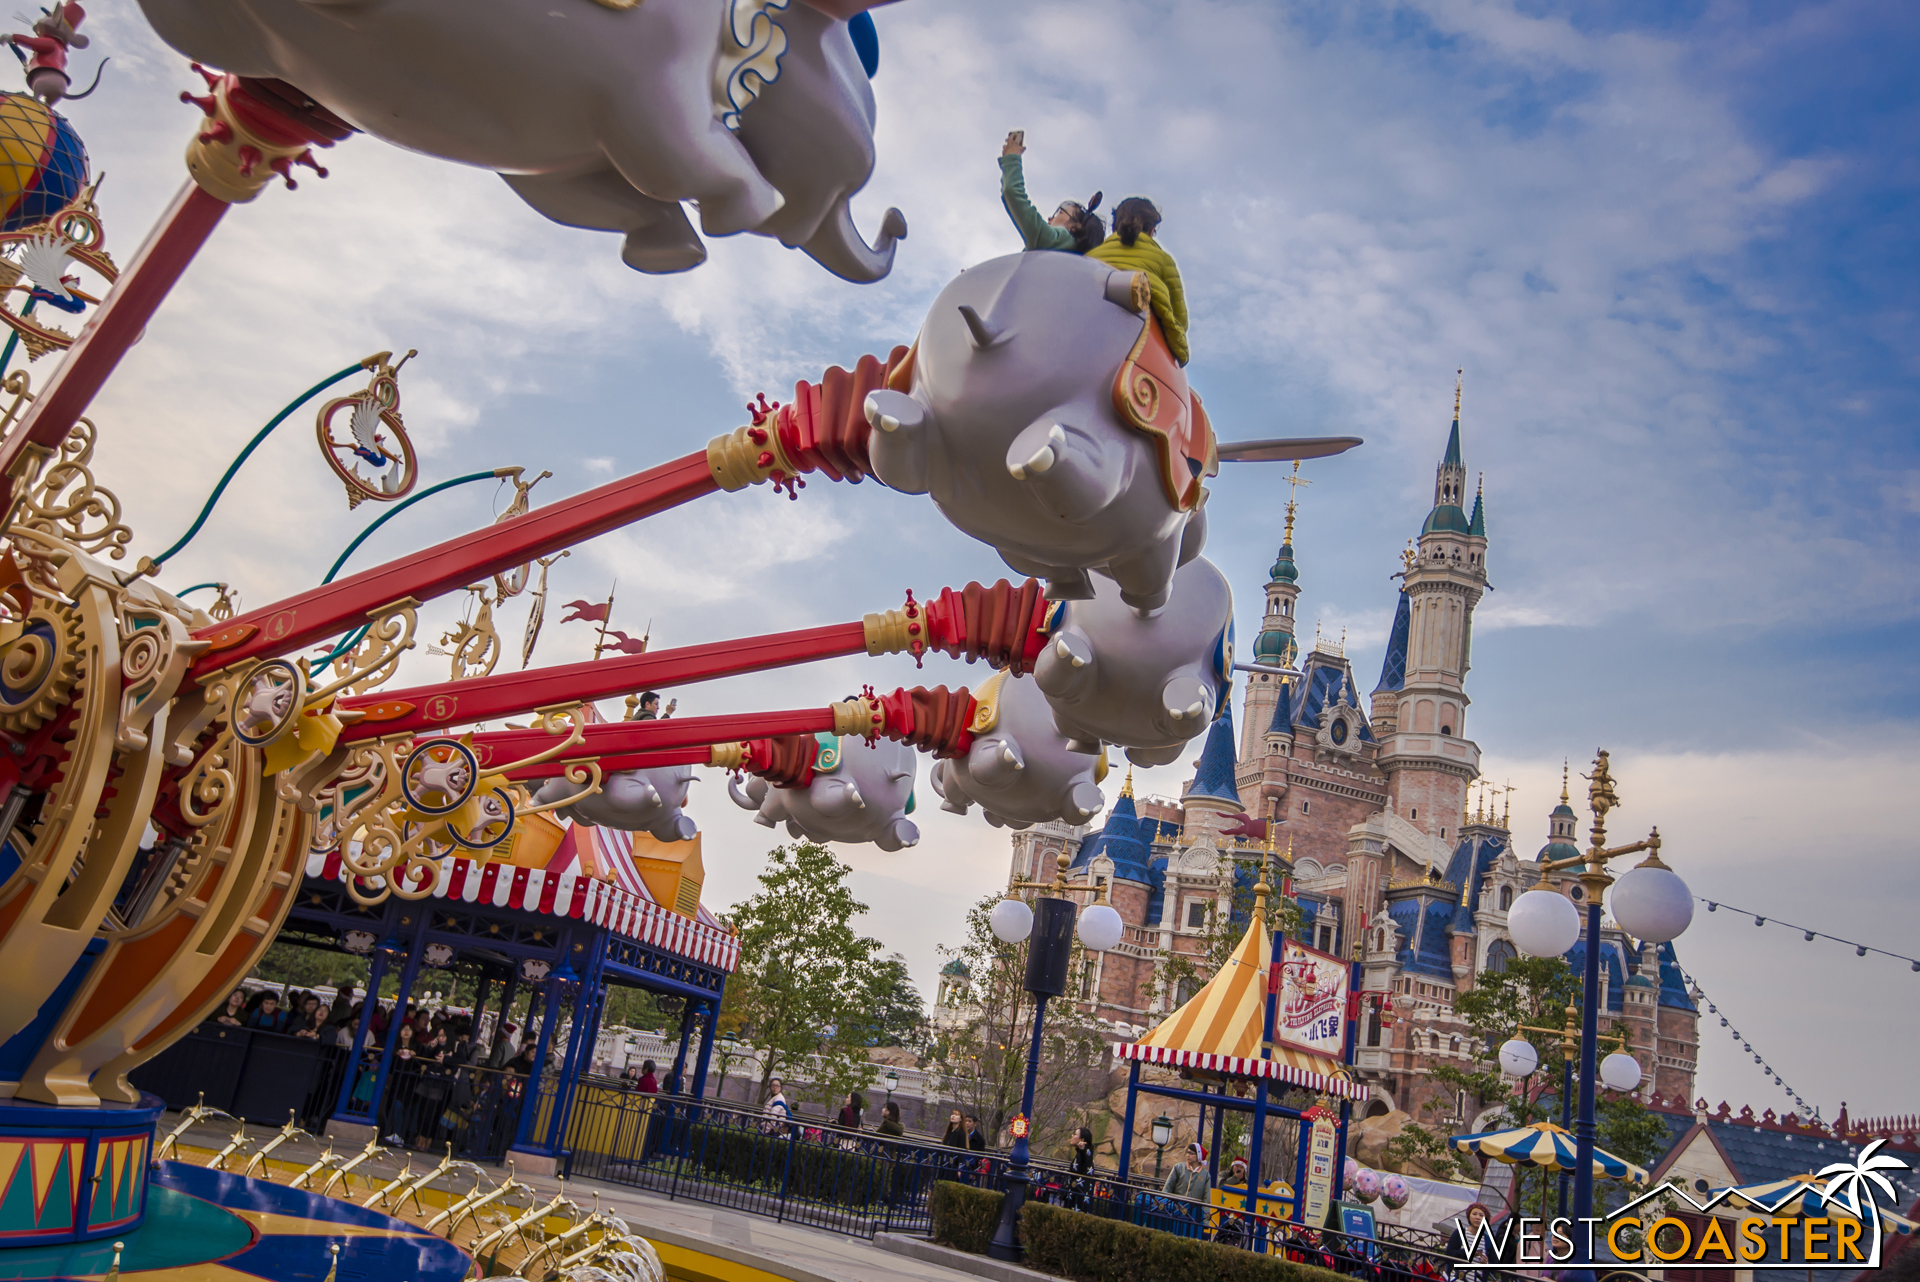 It offers the same thrill of flight to children as its international brethren.